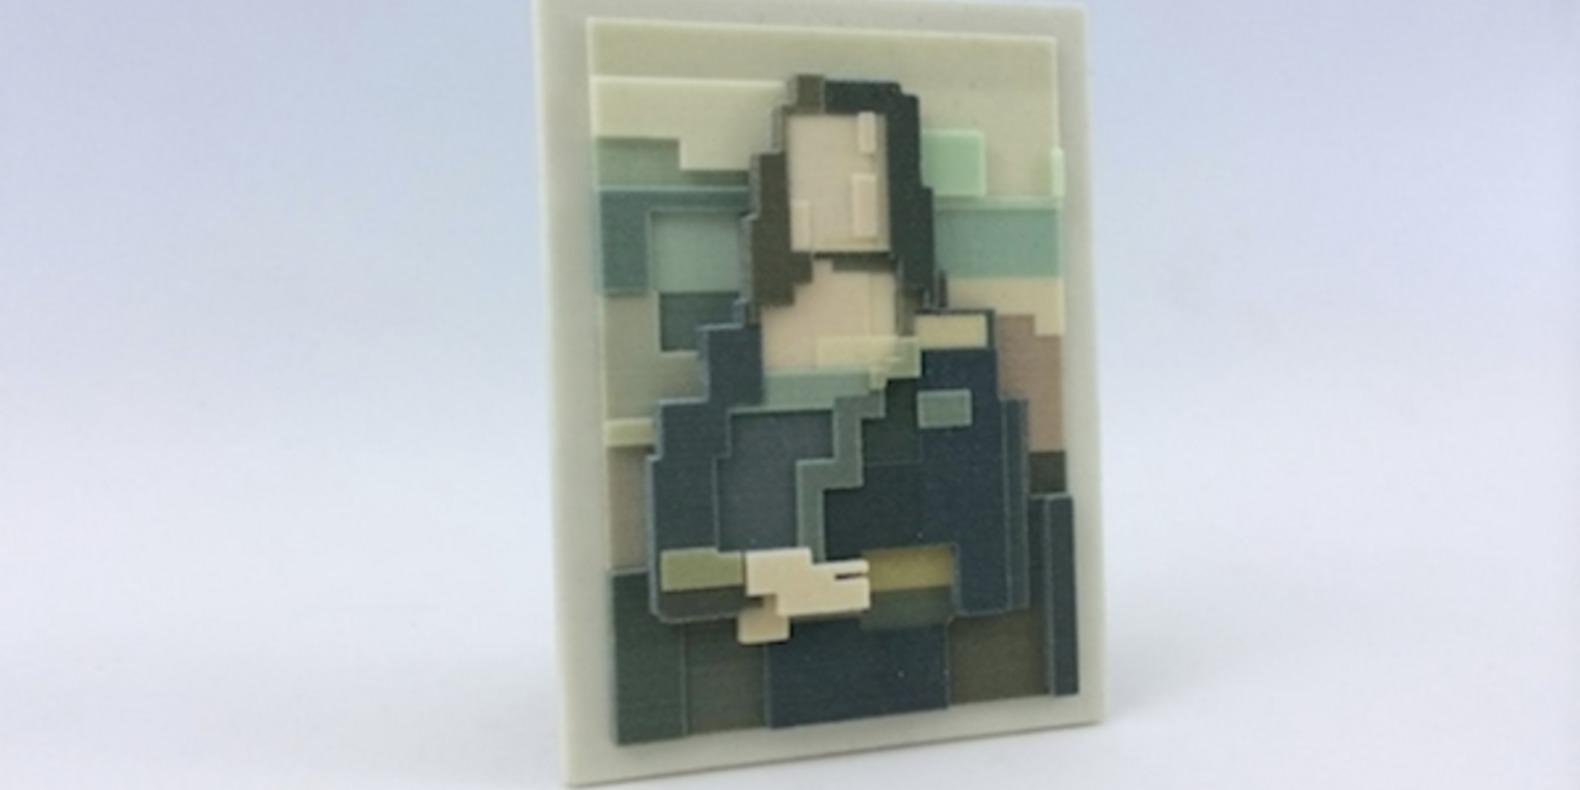 adam lister isaac budmen 8 Bits, 3 Dimensions art 3D printing printed cults3D fichier 3D designer artist ETR breaking bad superman mona lisa6